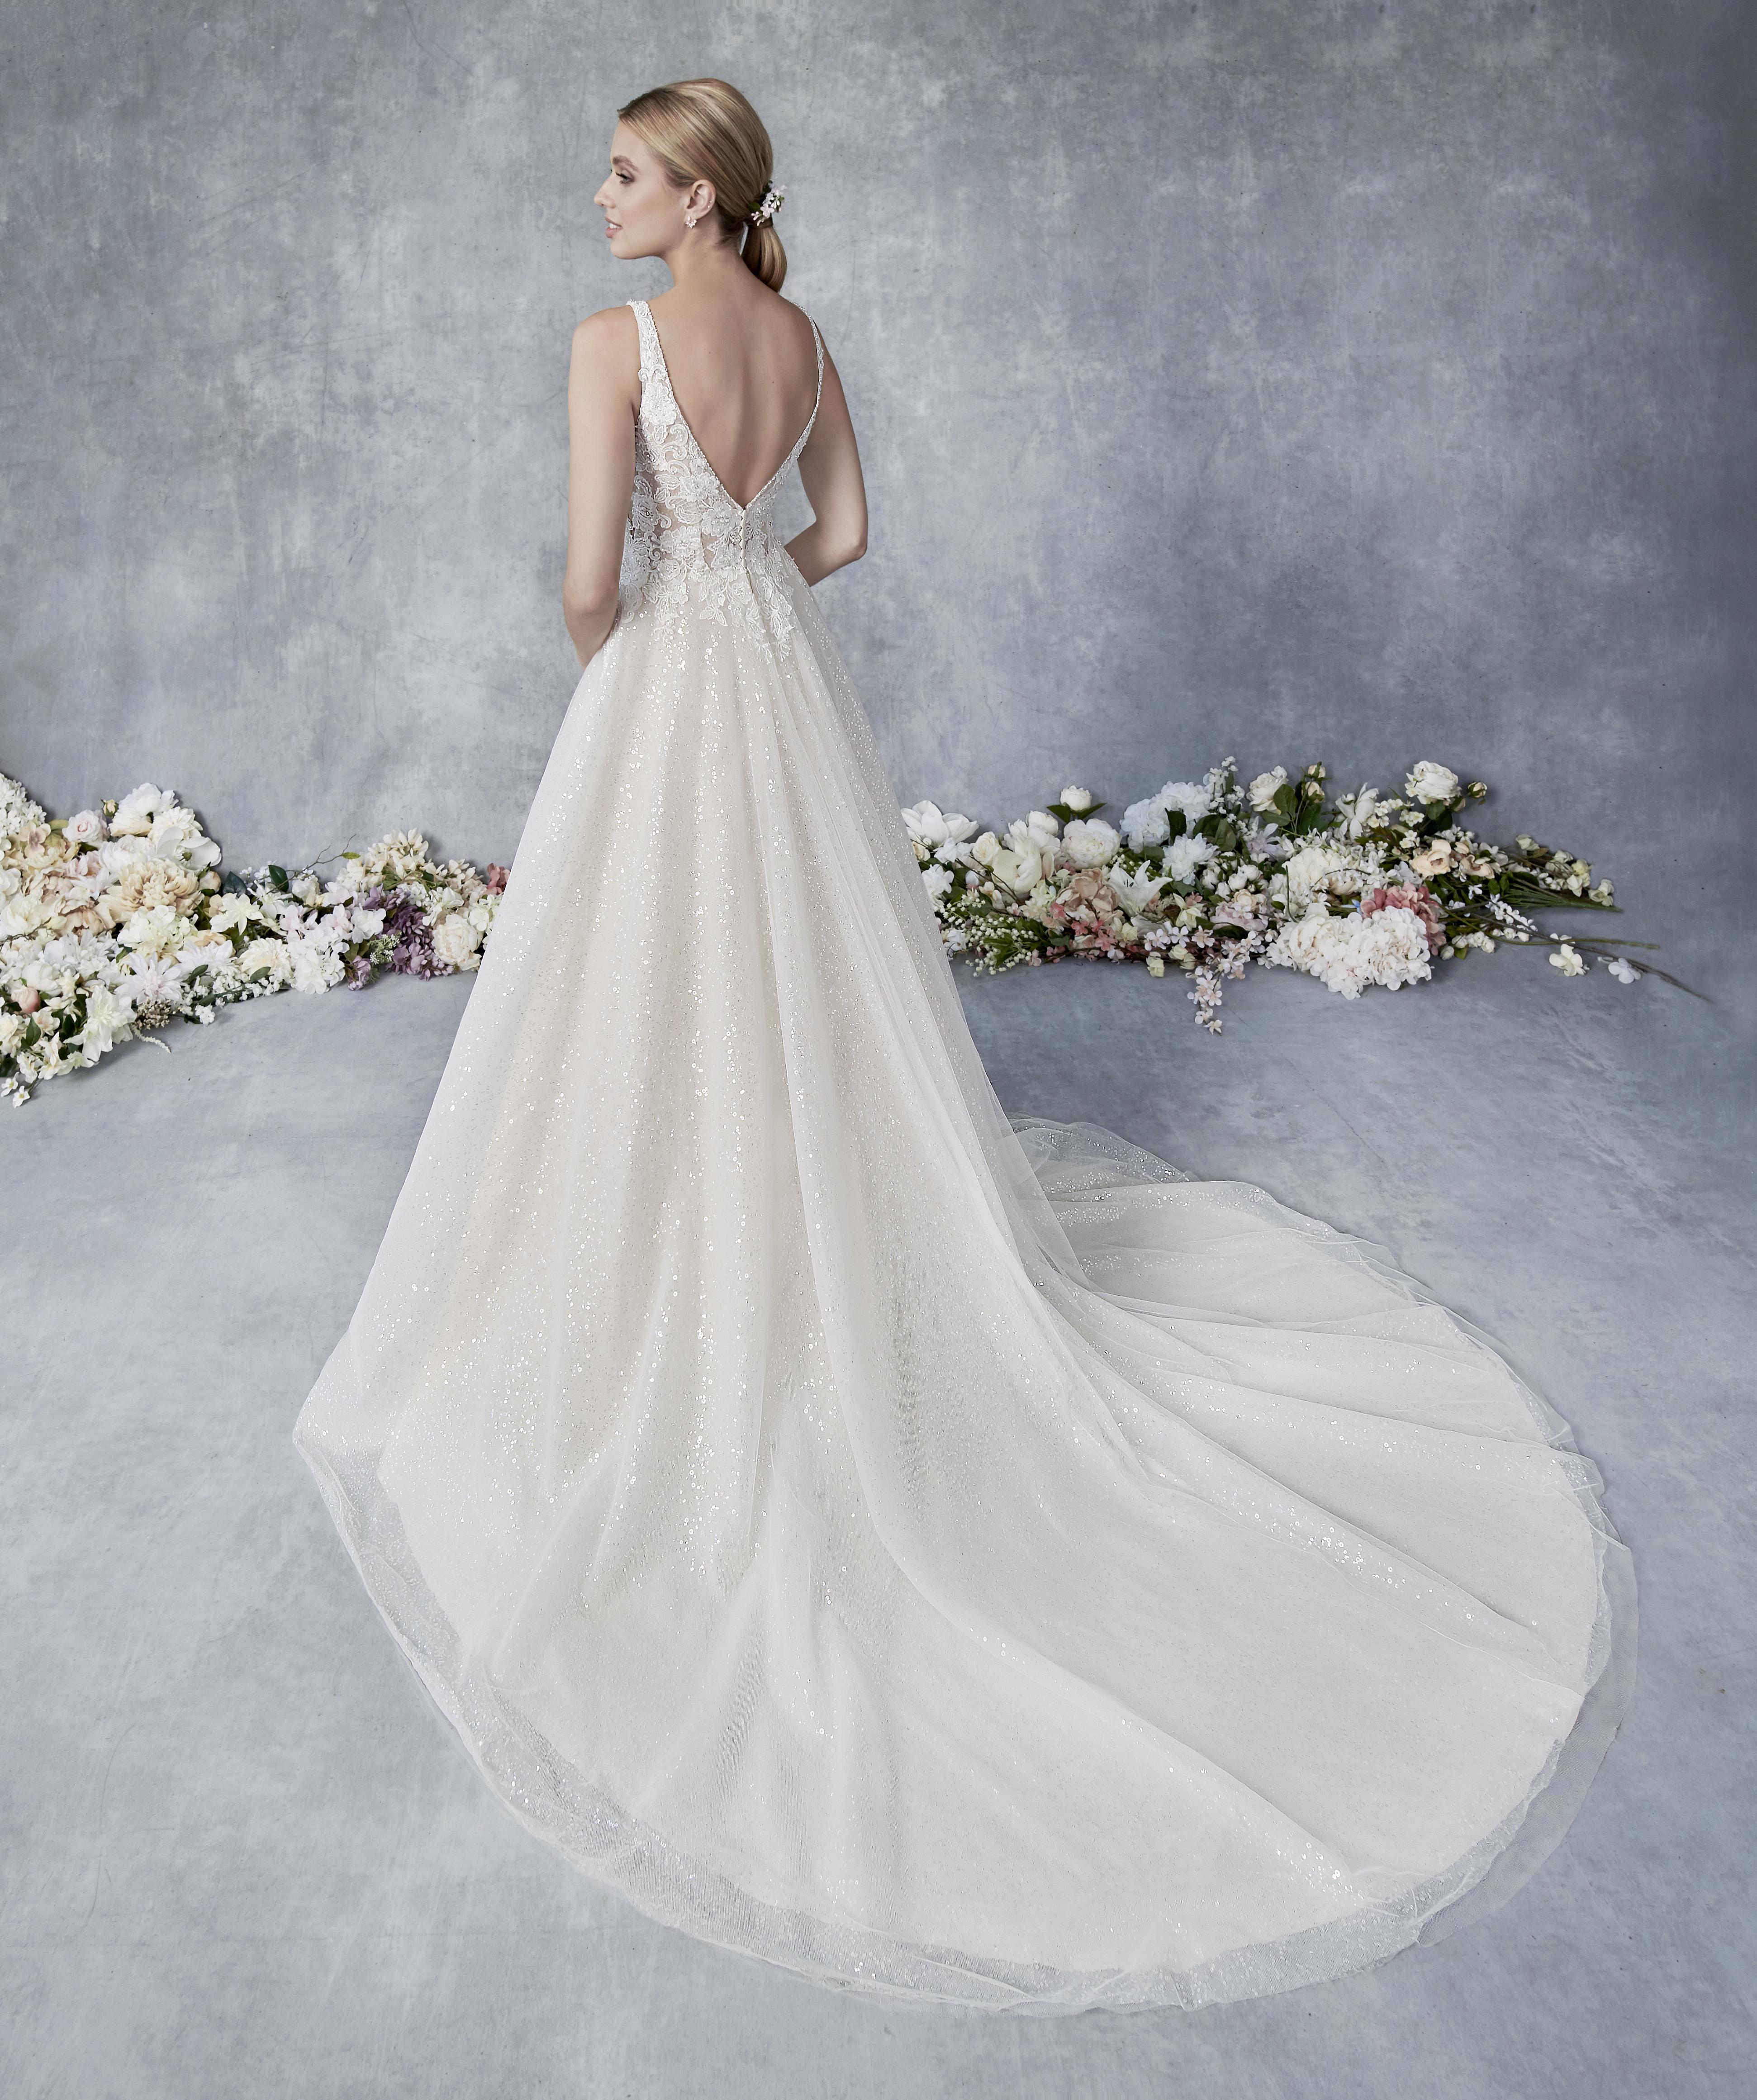 ella-rose-be544-wedding-dress